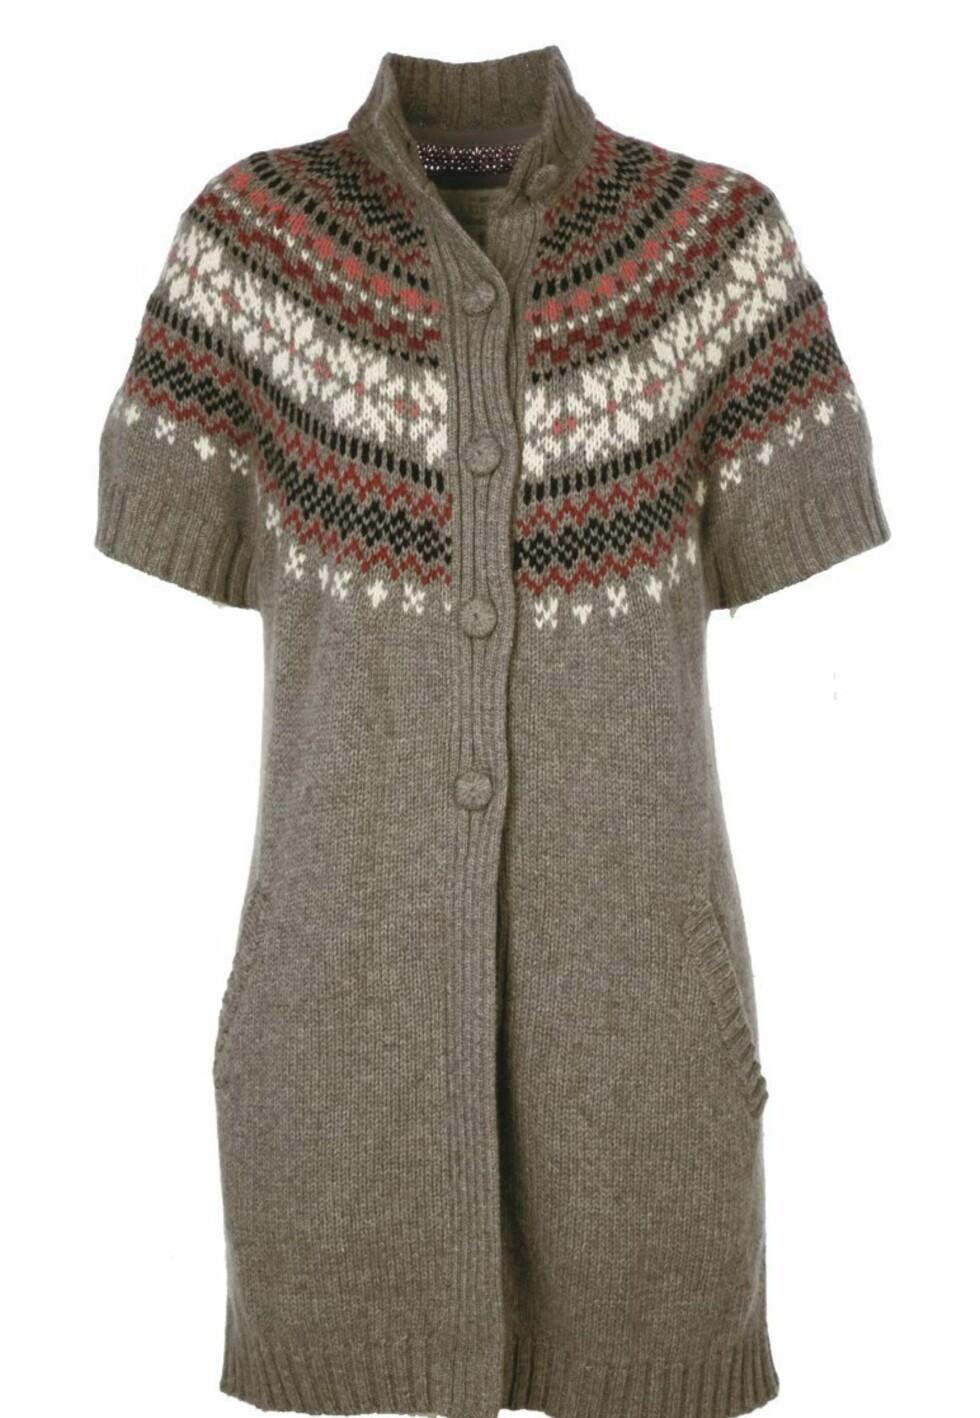 Mønstret ullkardigan - perfekt til enten tights eller jeans (kr 1795, Lexington).